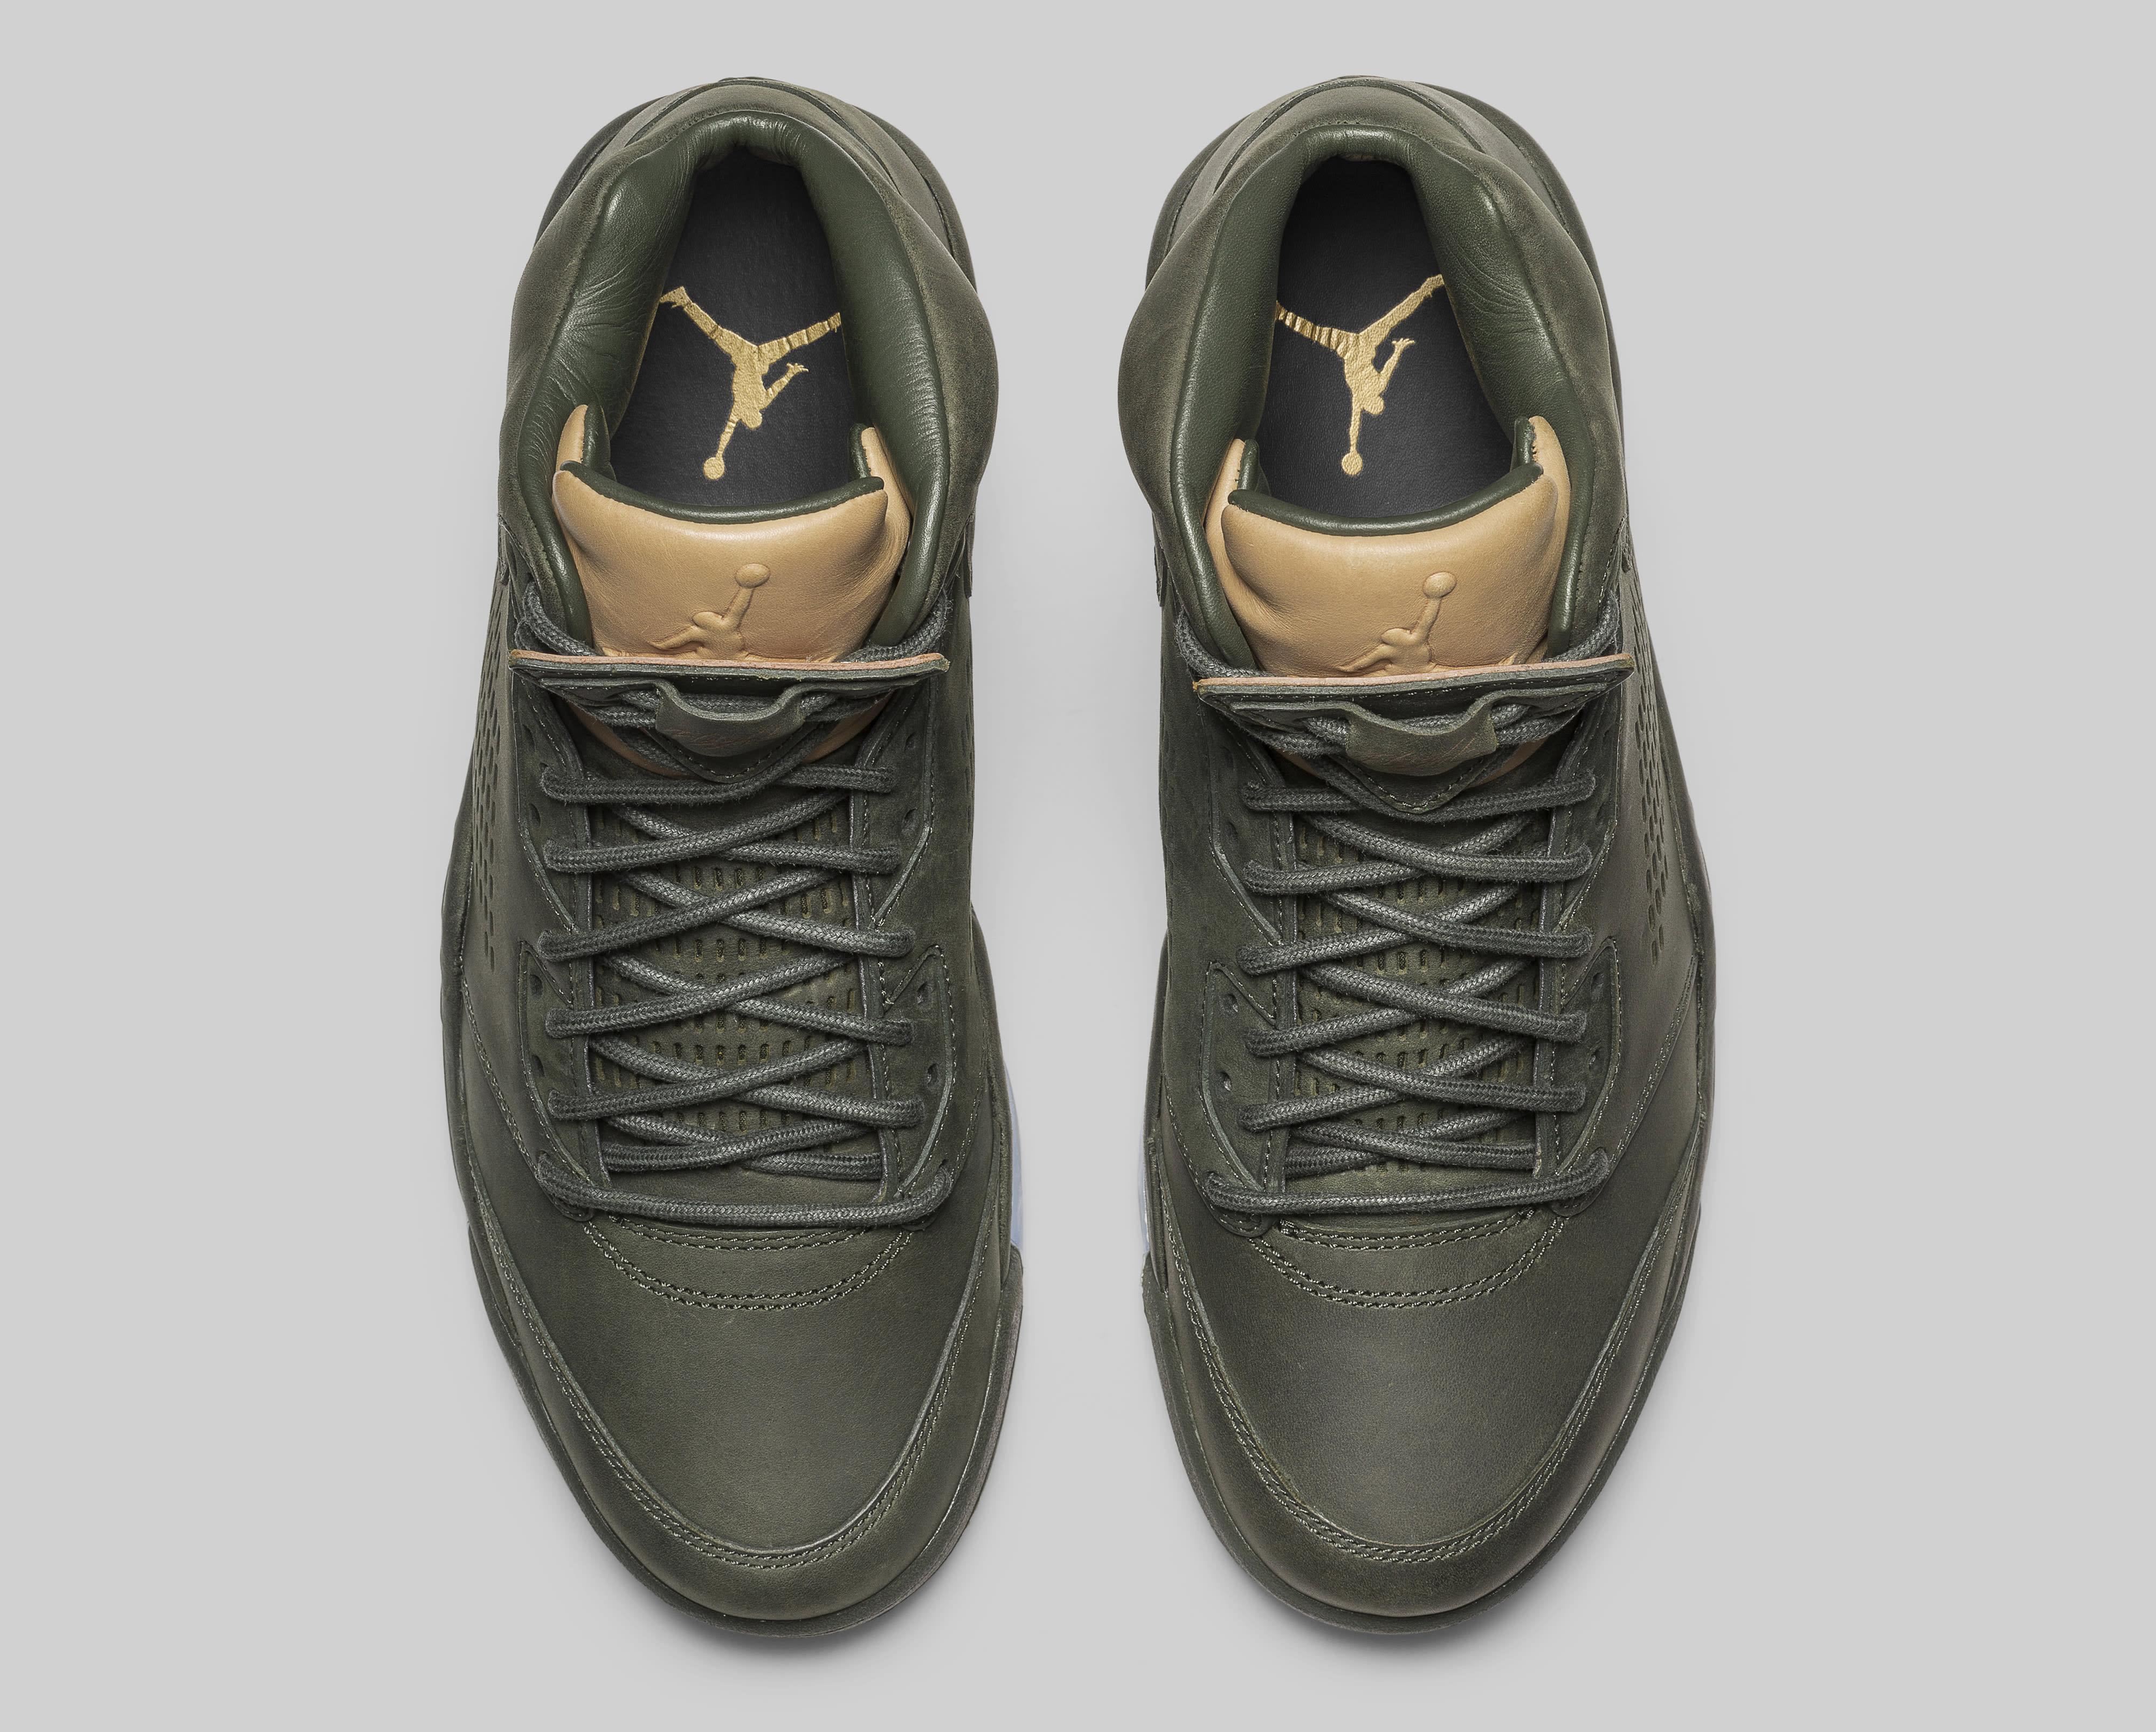 983a6f8a17bb Image via Nike Take Flight Air Jordan 5 881432-305 Top